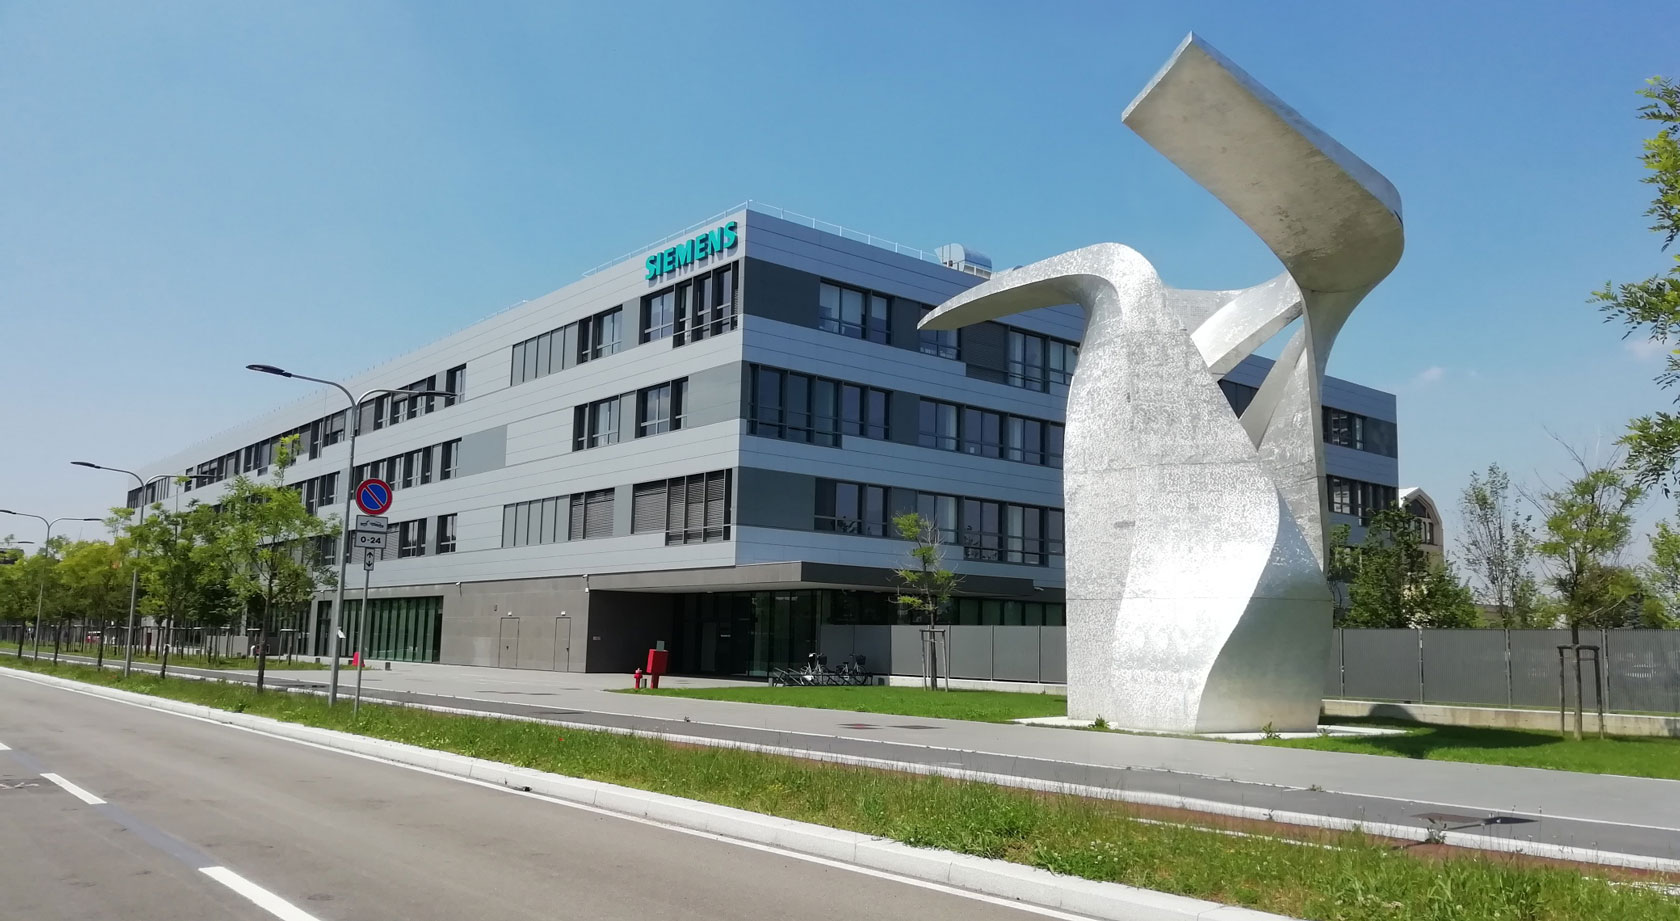 Siemens sposta i processi verso il digitale